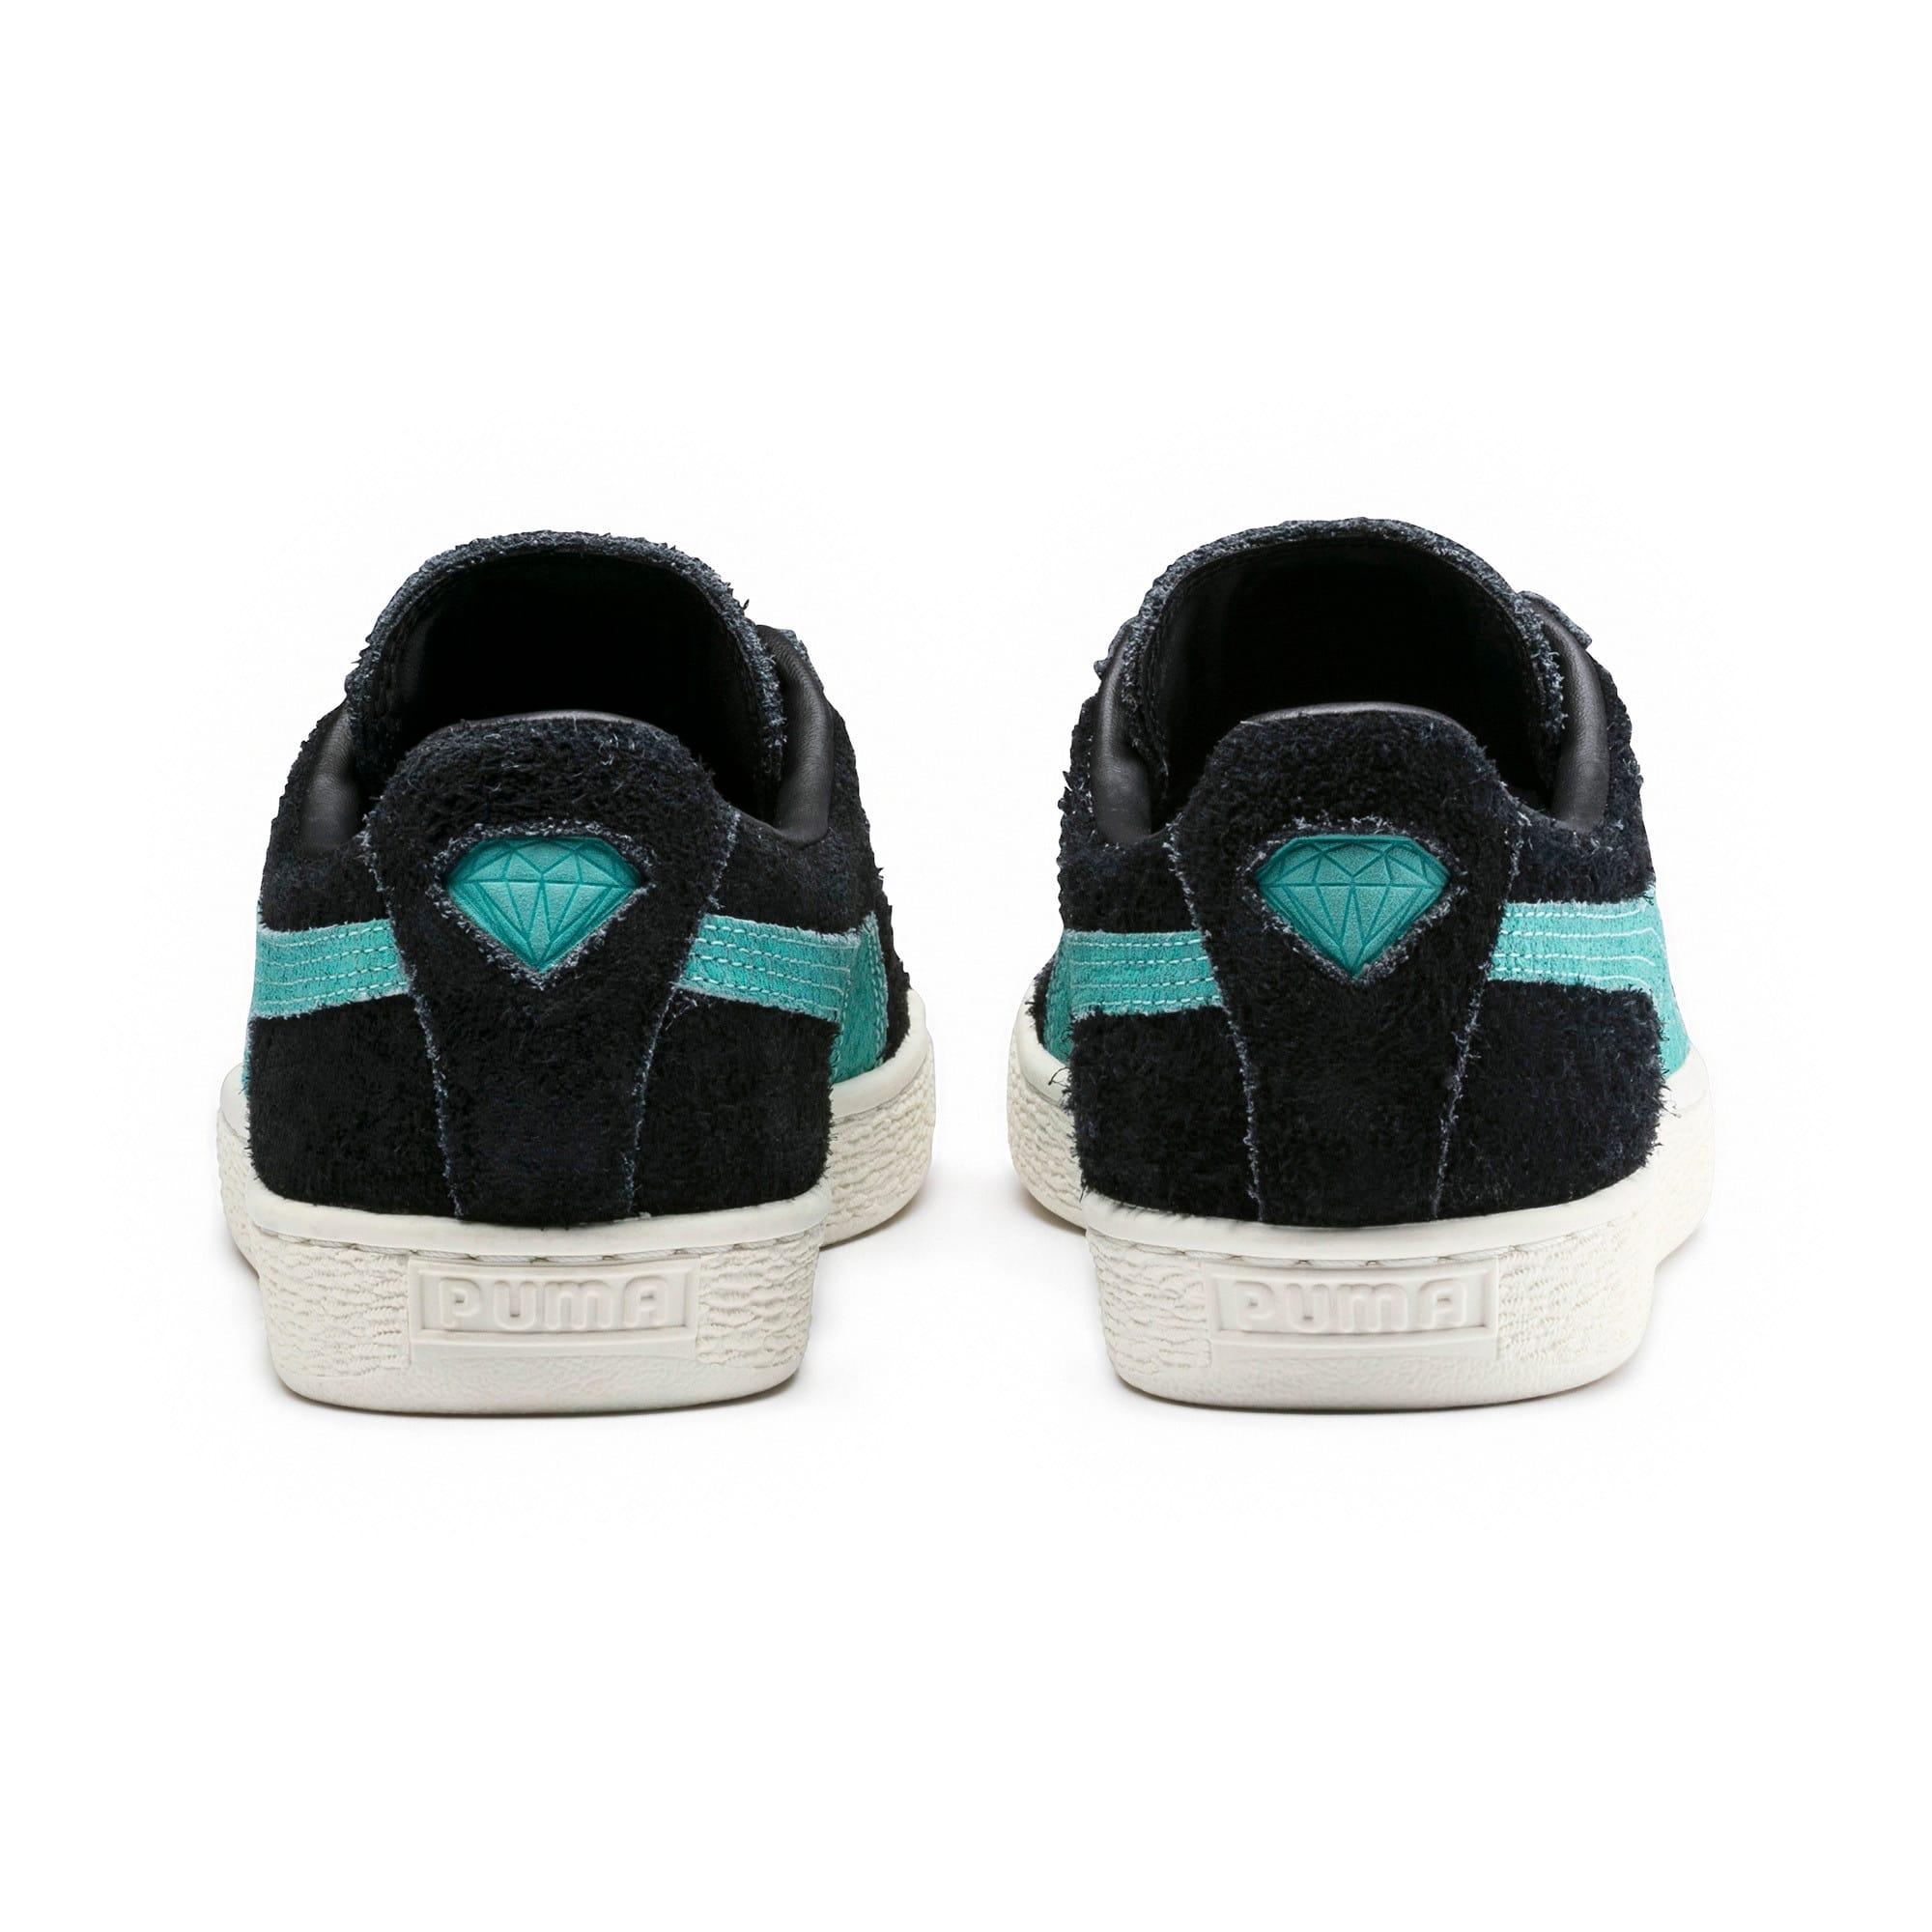 Thumbnail 4 of PUMA x DIAMOND Suede Sneakers, Puma Black-Diamond Blue, medium